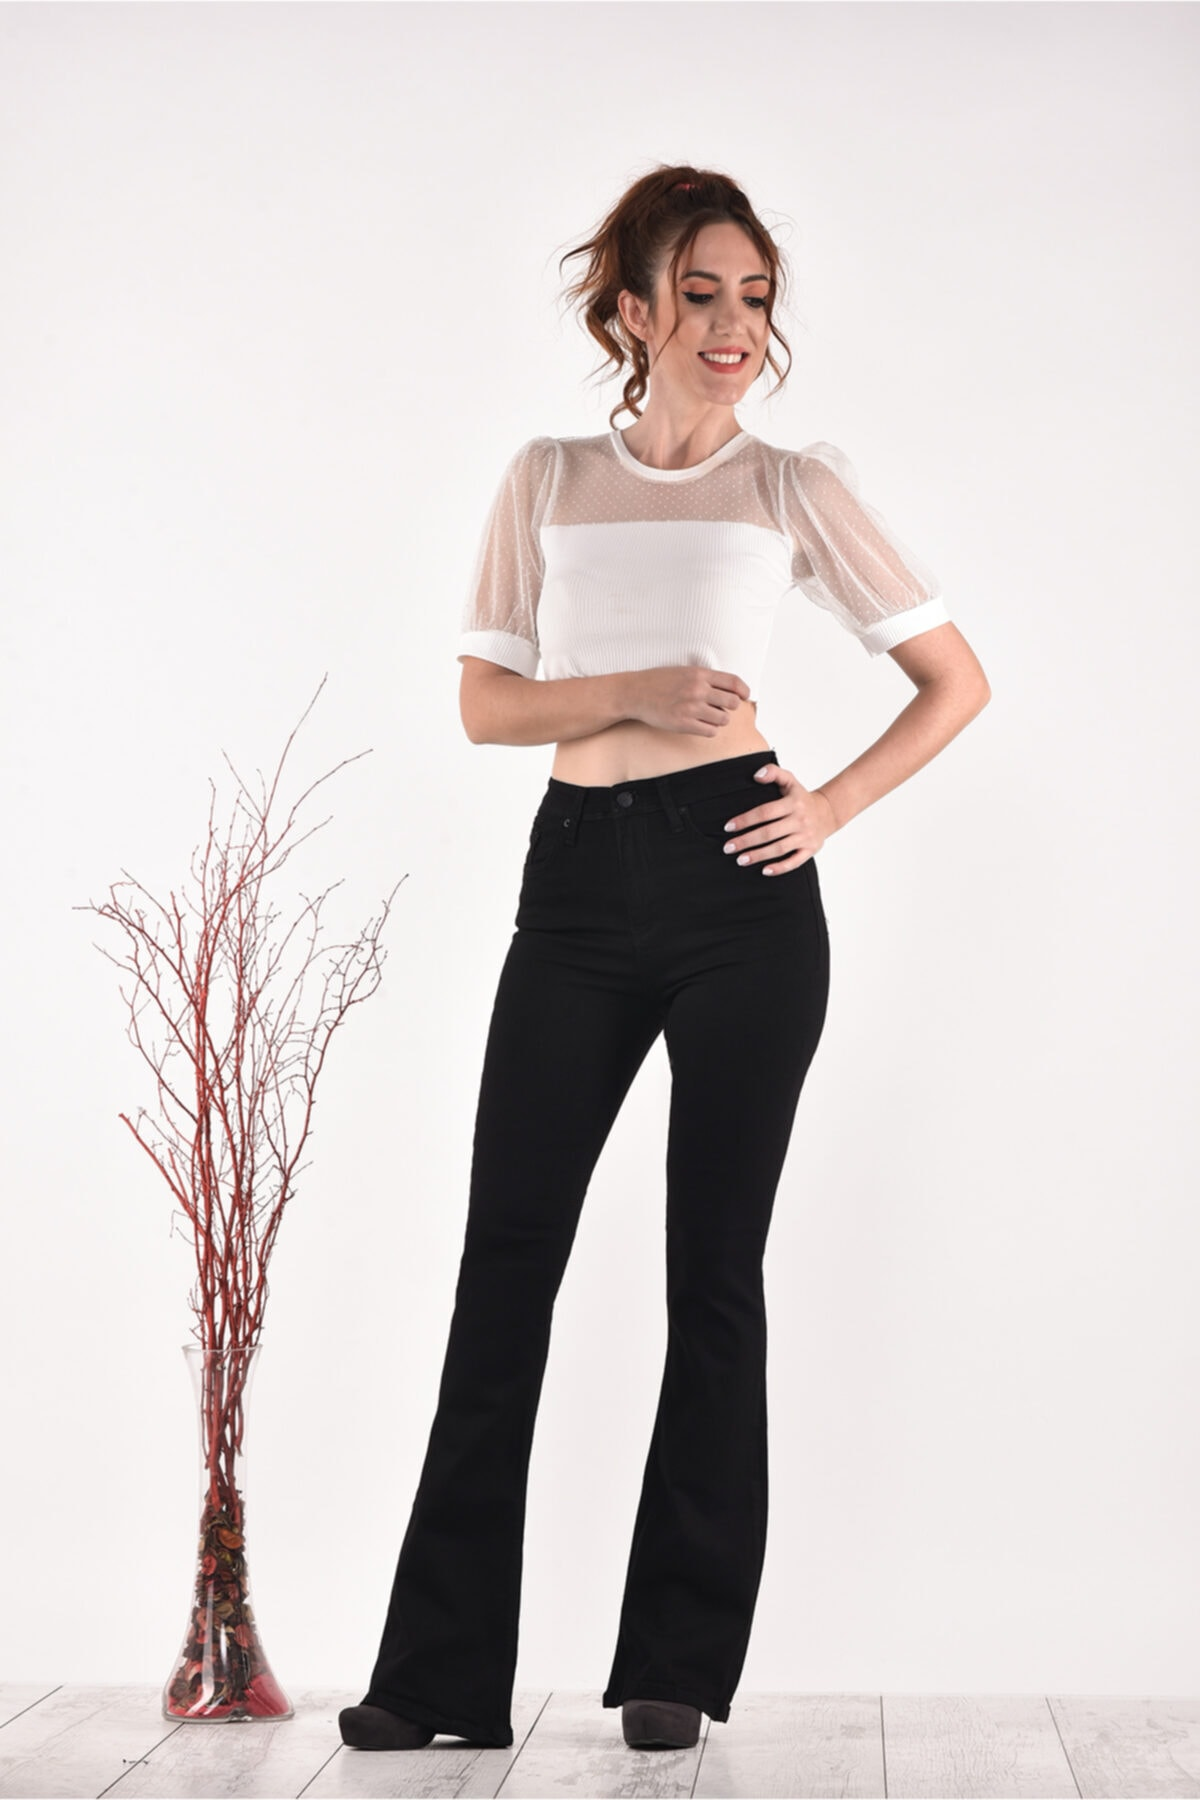 PANTOLOJİ Yüksek Bel Ispanyol Paça 823 Model Black Bayan Jeans Pantolon 2